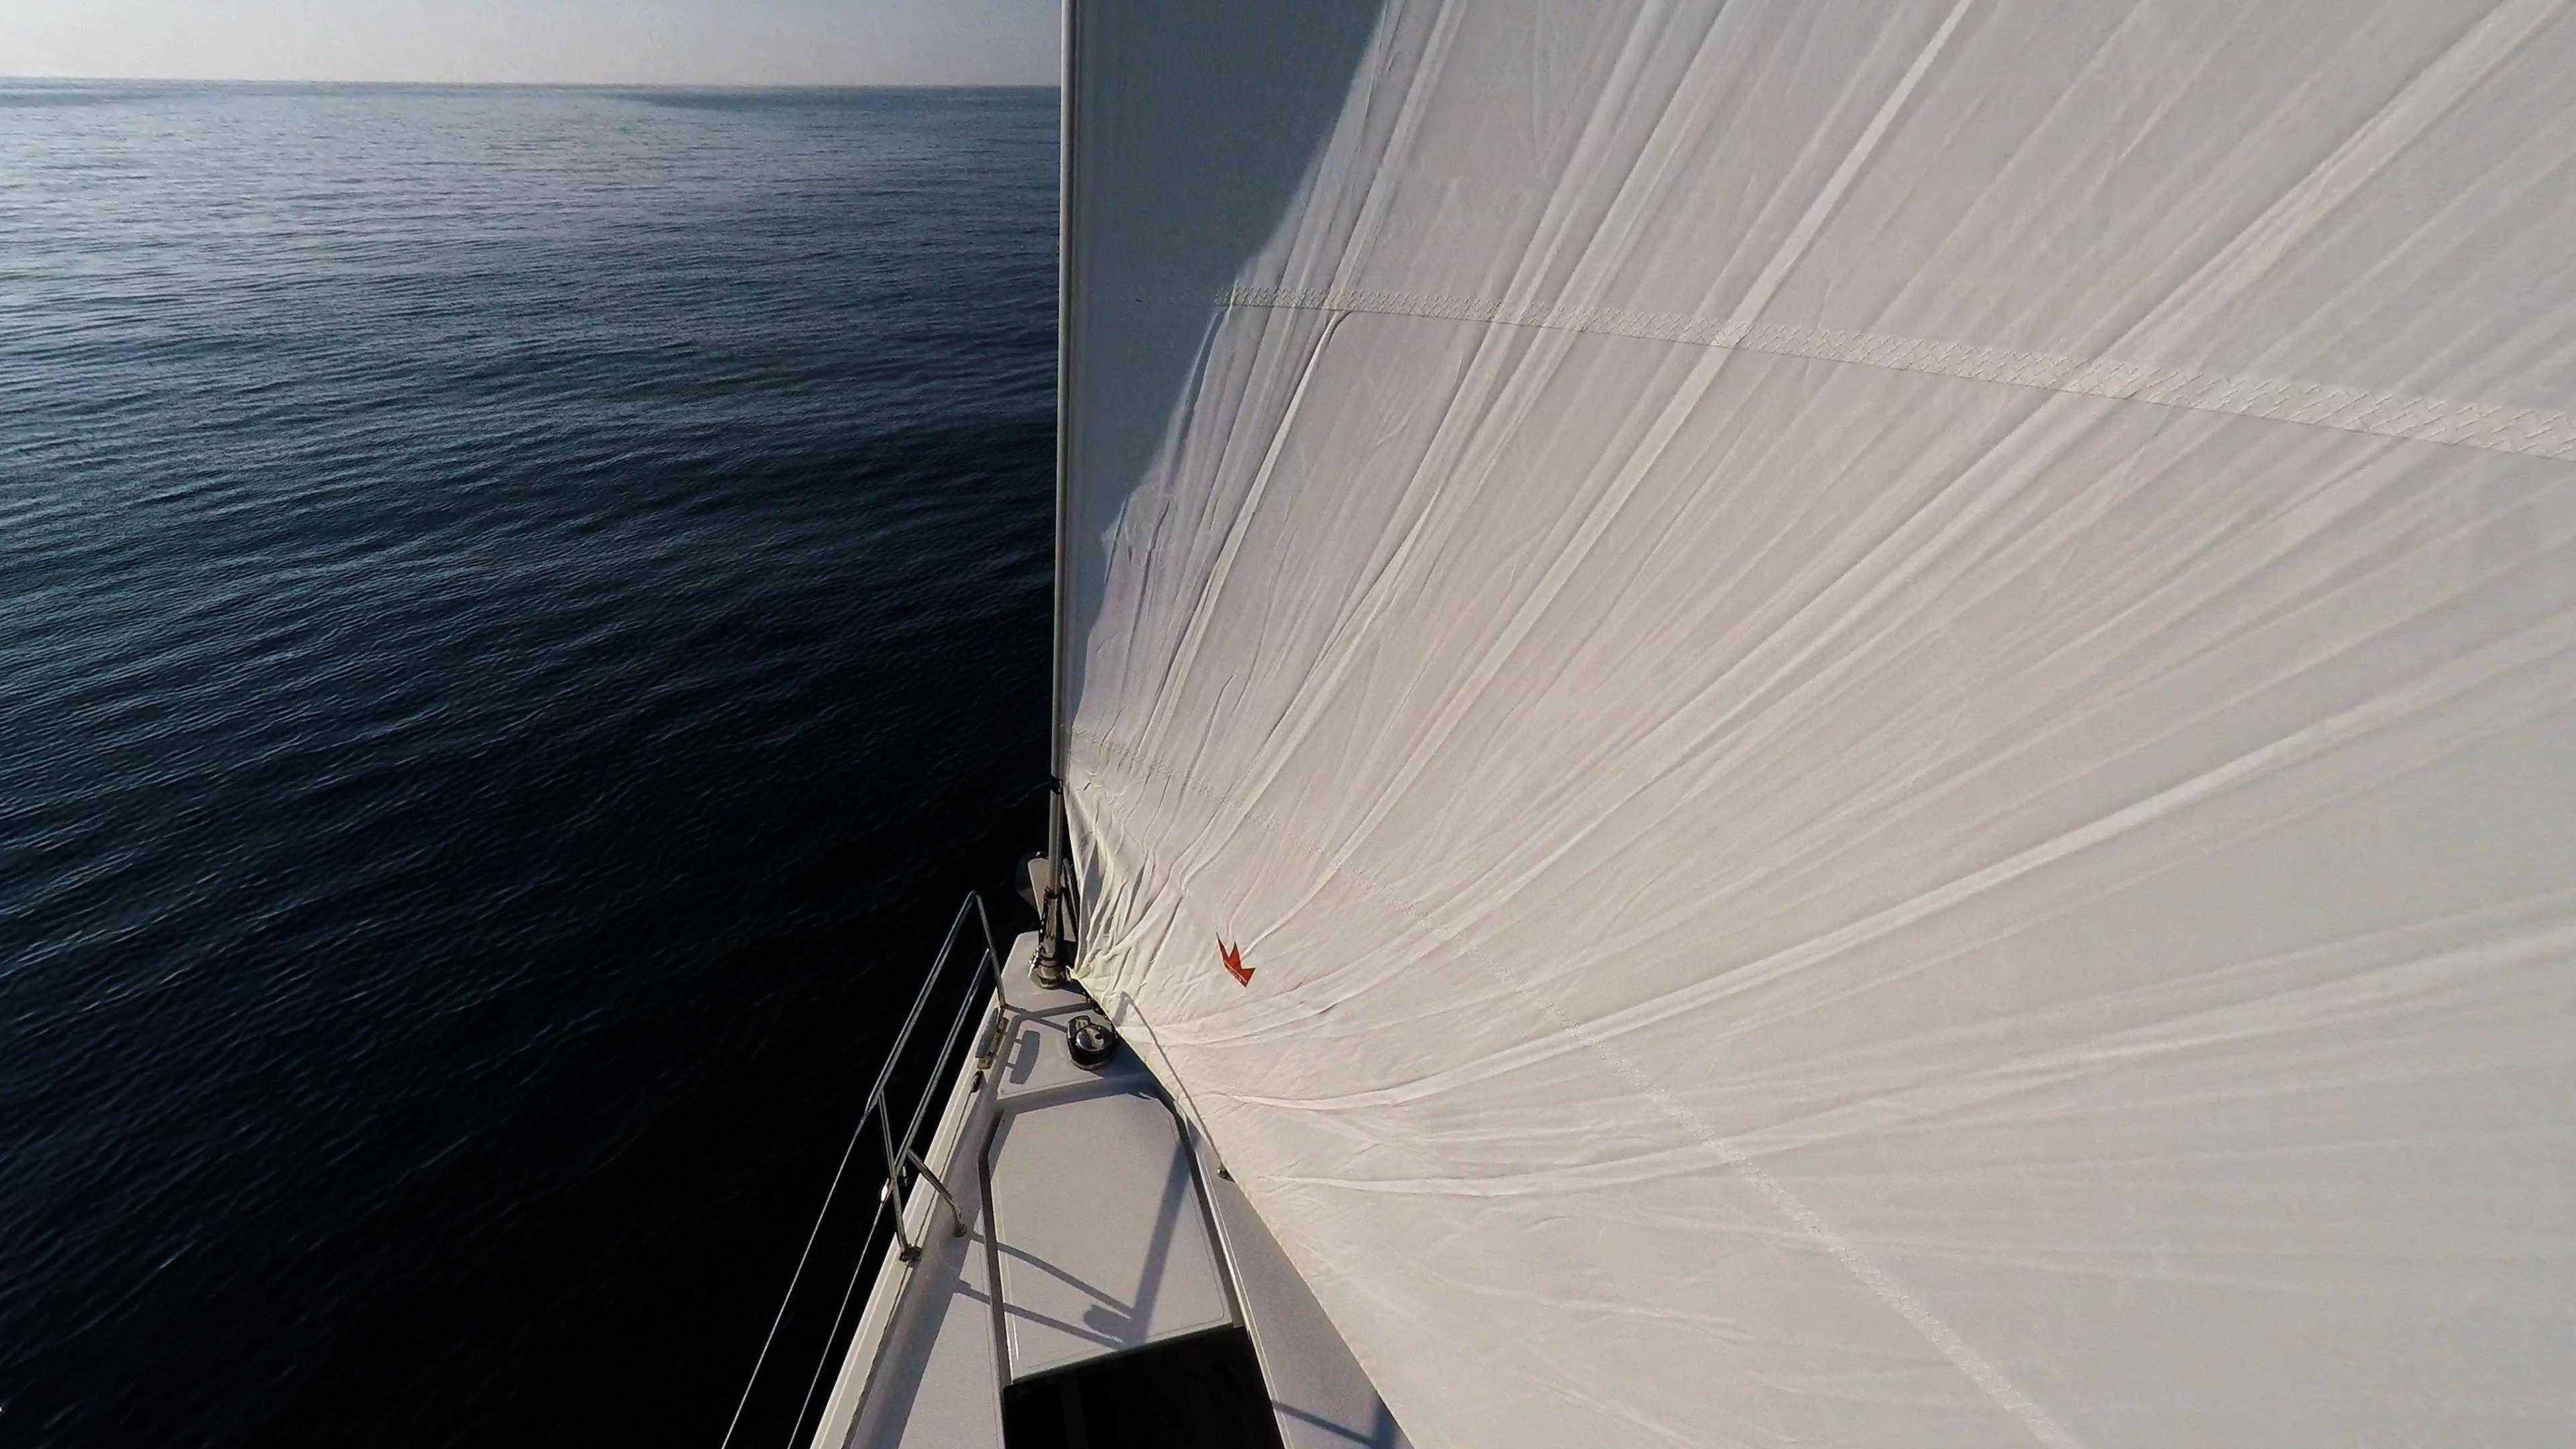 barcha a vela prua della barca a vela genova ancora ponte yacht a vela